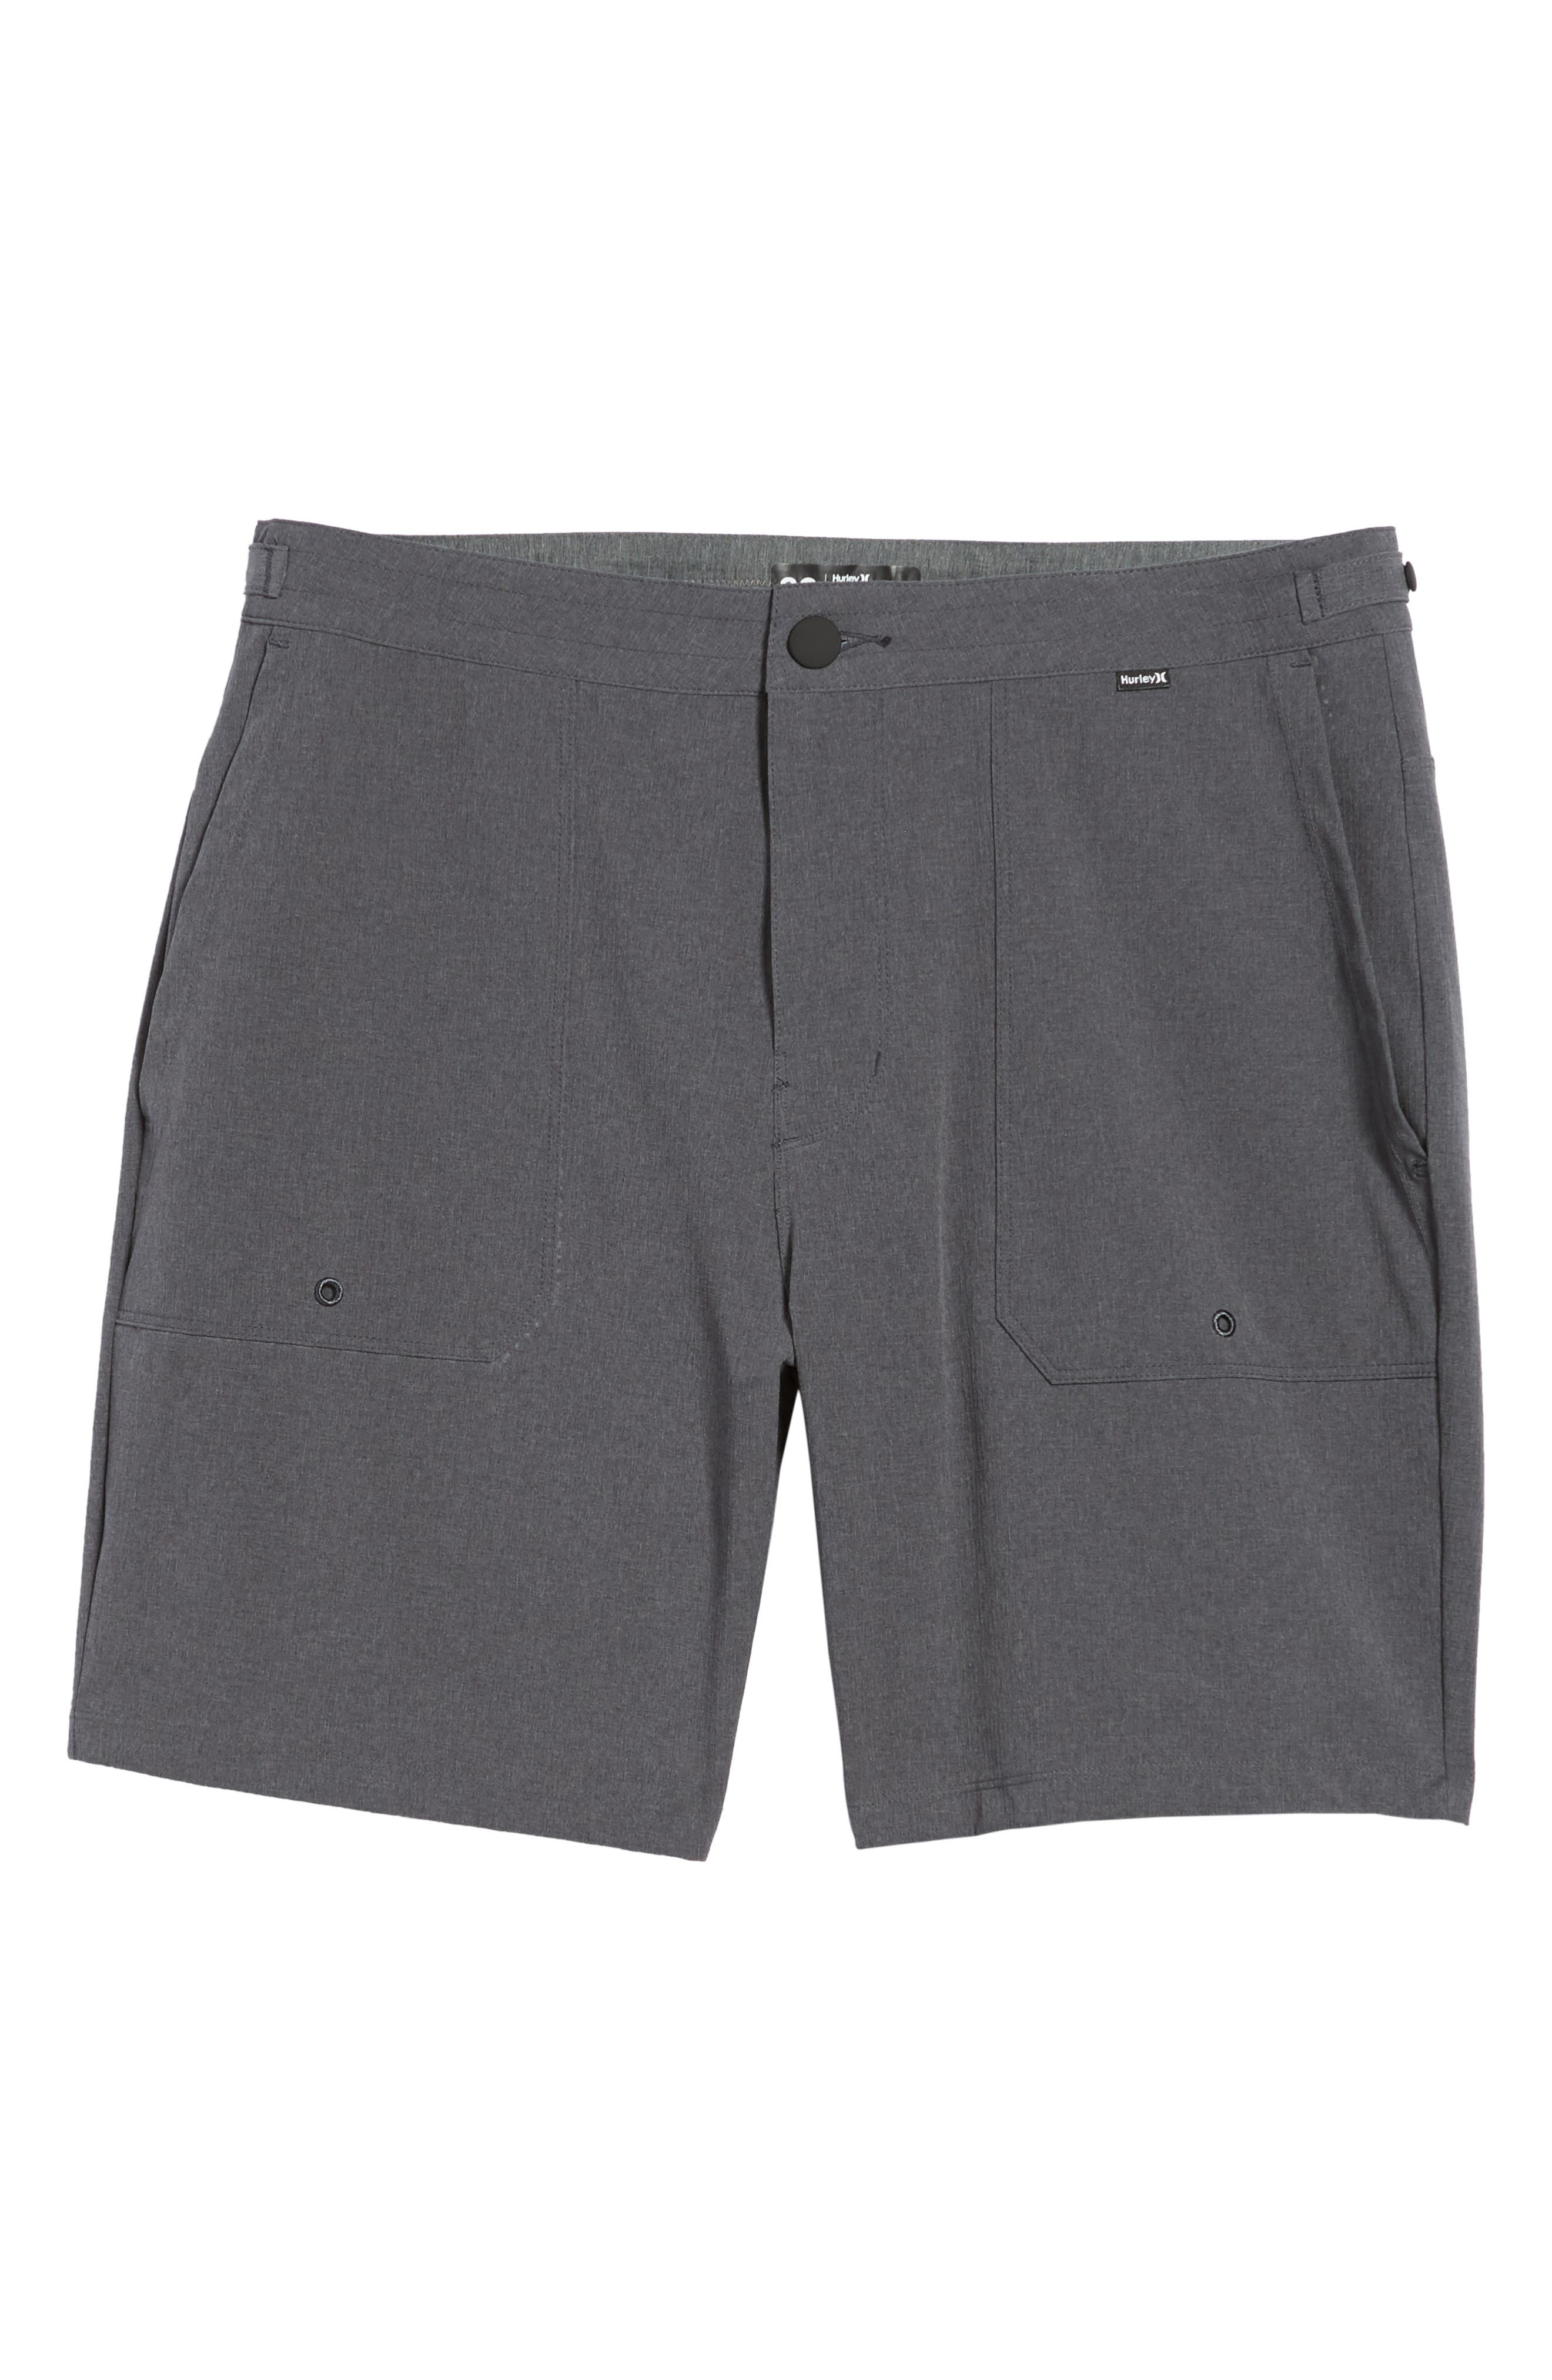 Phantom Coastline Shorts,                             Alternate thumbnail 6, color,                             Black Heather